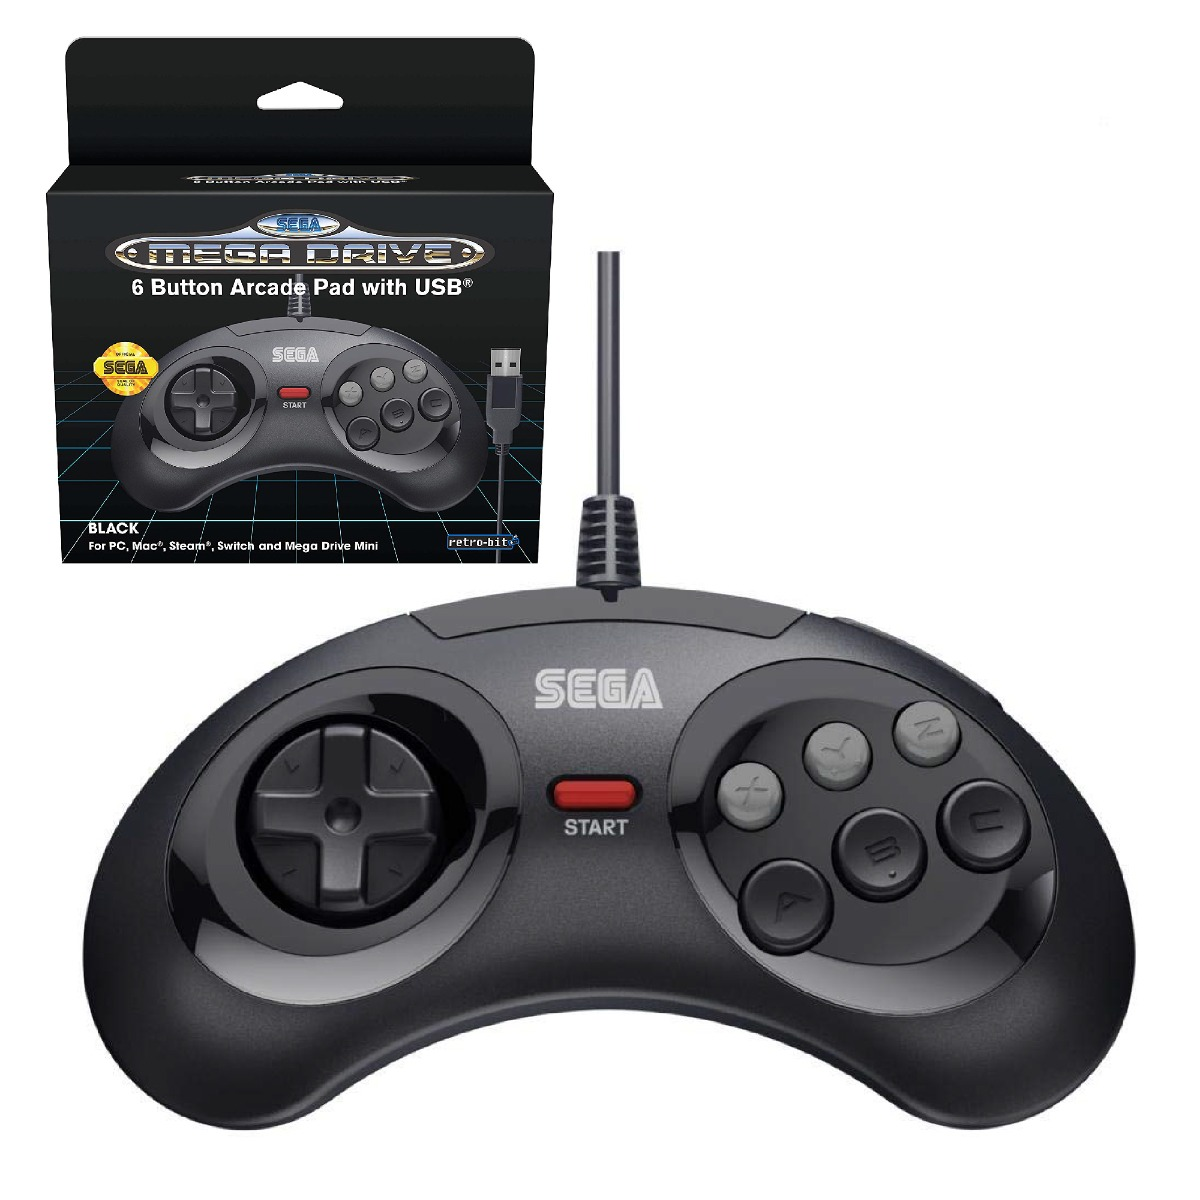 SEGA, Retro-Bit, Mega Drive, Original, Controller, 6-Button, USB, Mega Drive Mini, PC, Mac, Steam, PS3, Switch